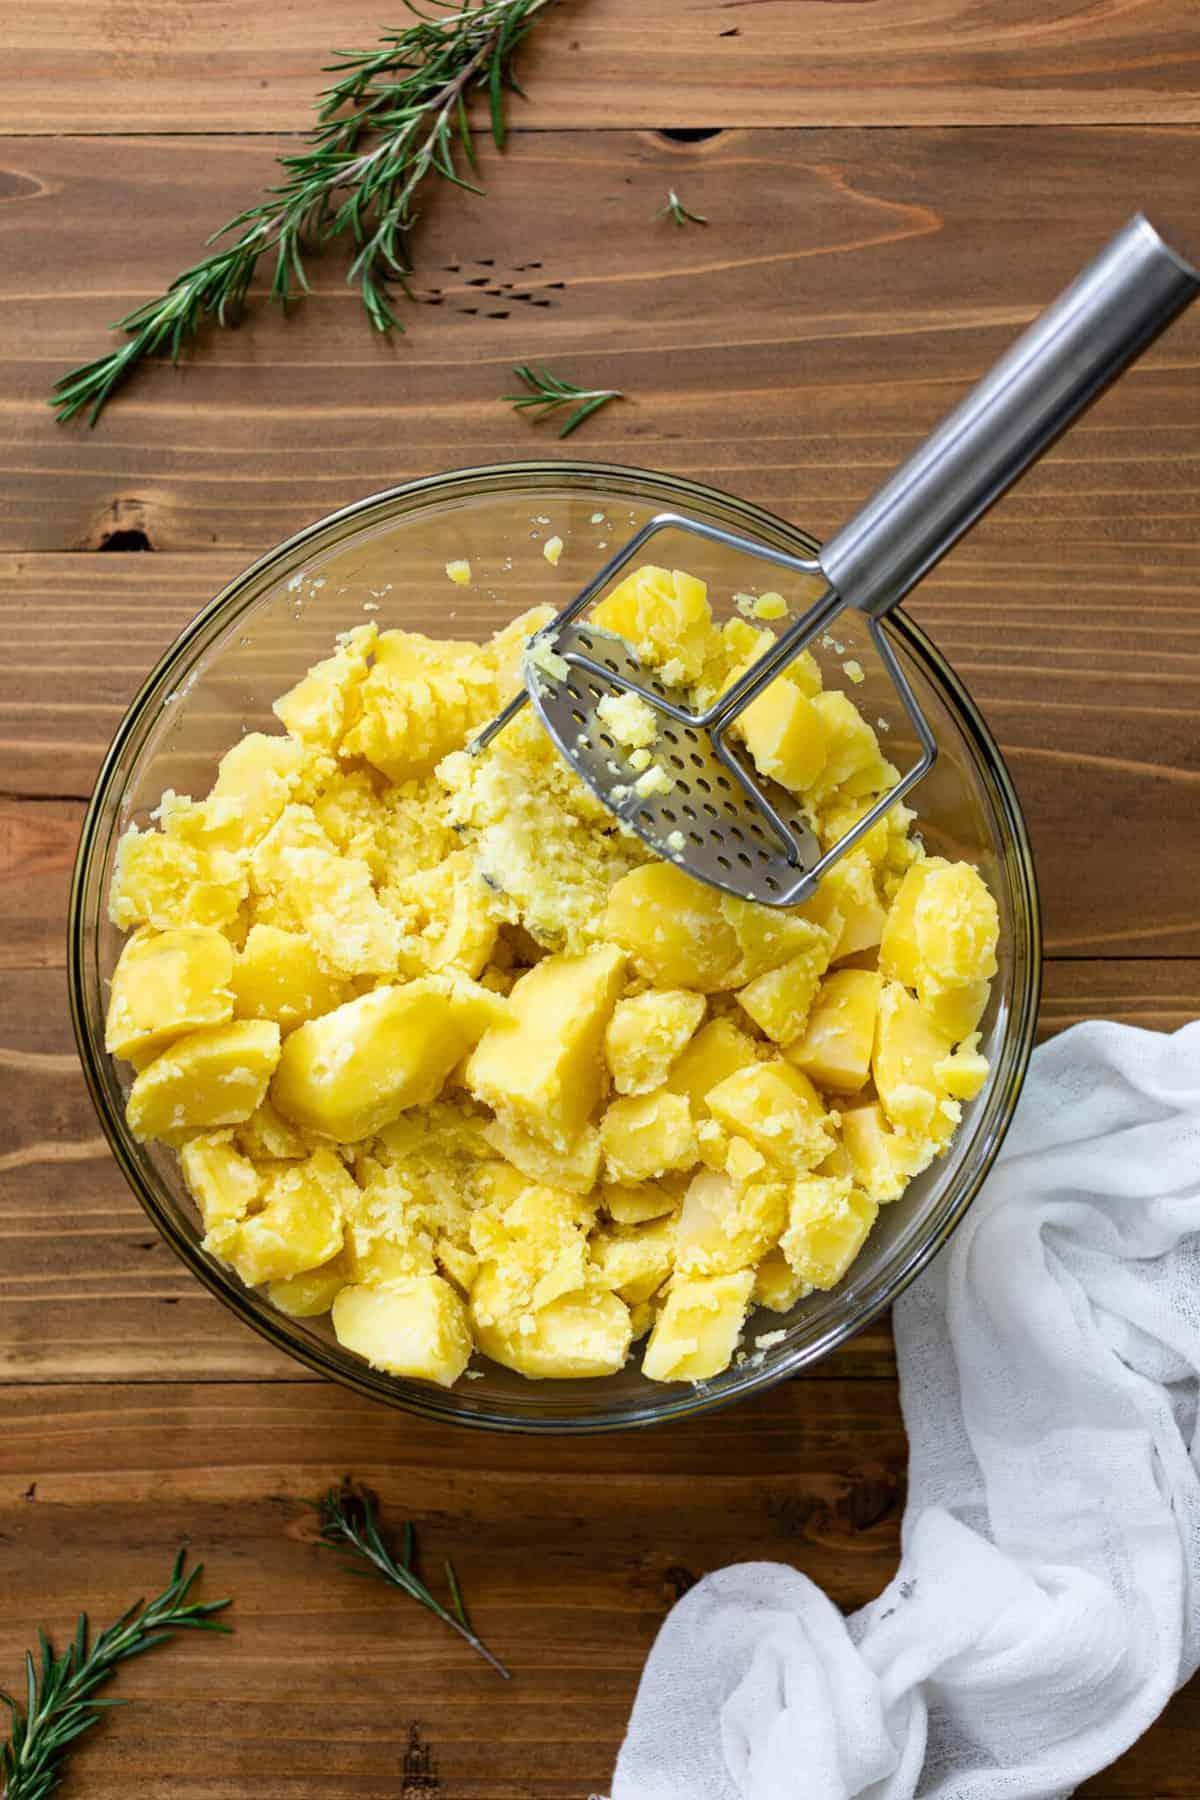 Vegan Chickpea + Broccoli Mashed Potato Bowl